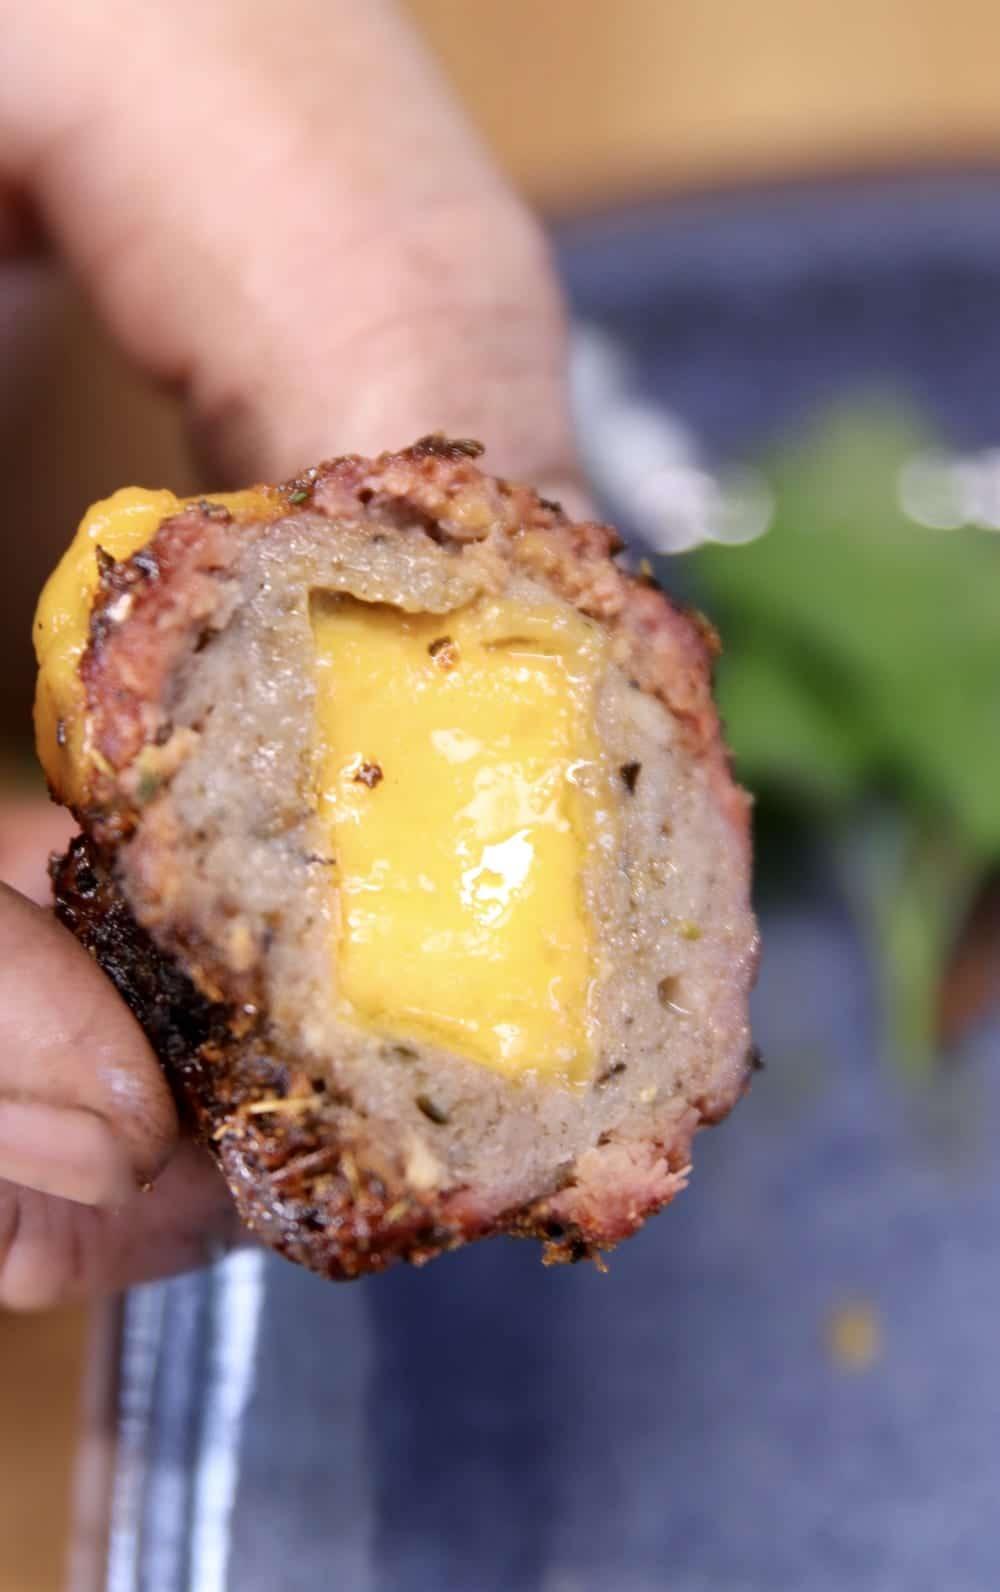 Cheddar stuffed meatball, cut in half, close up